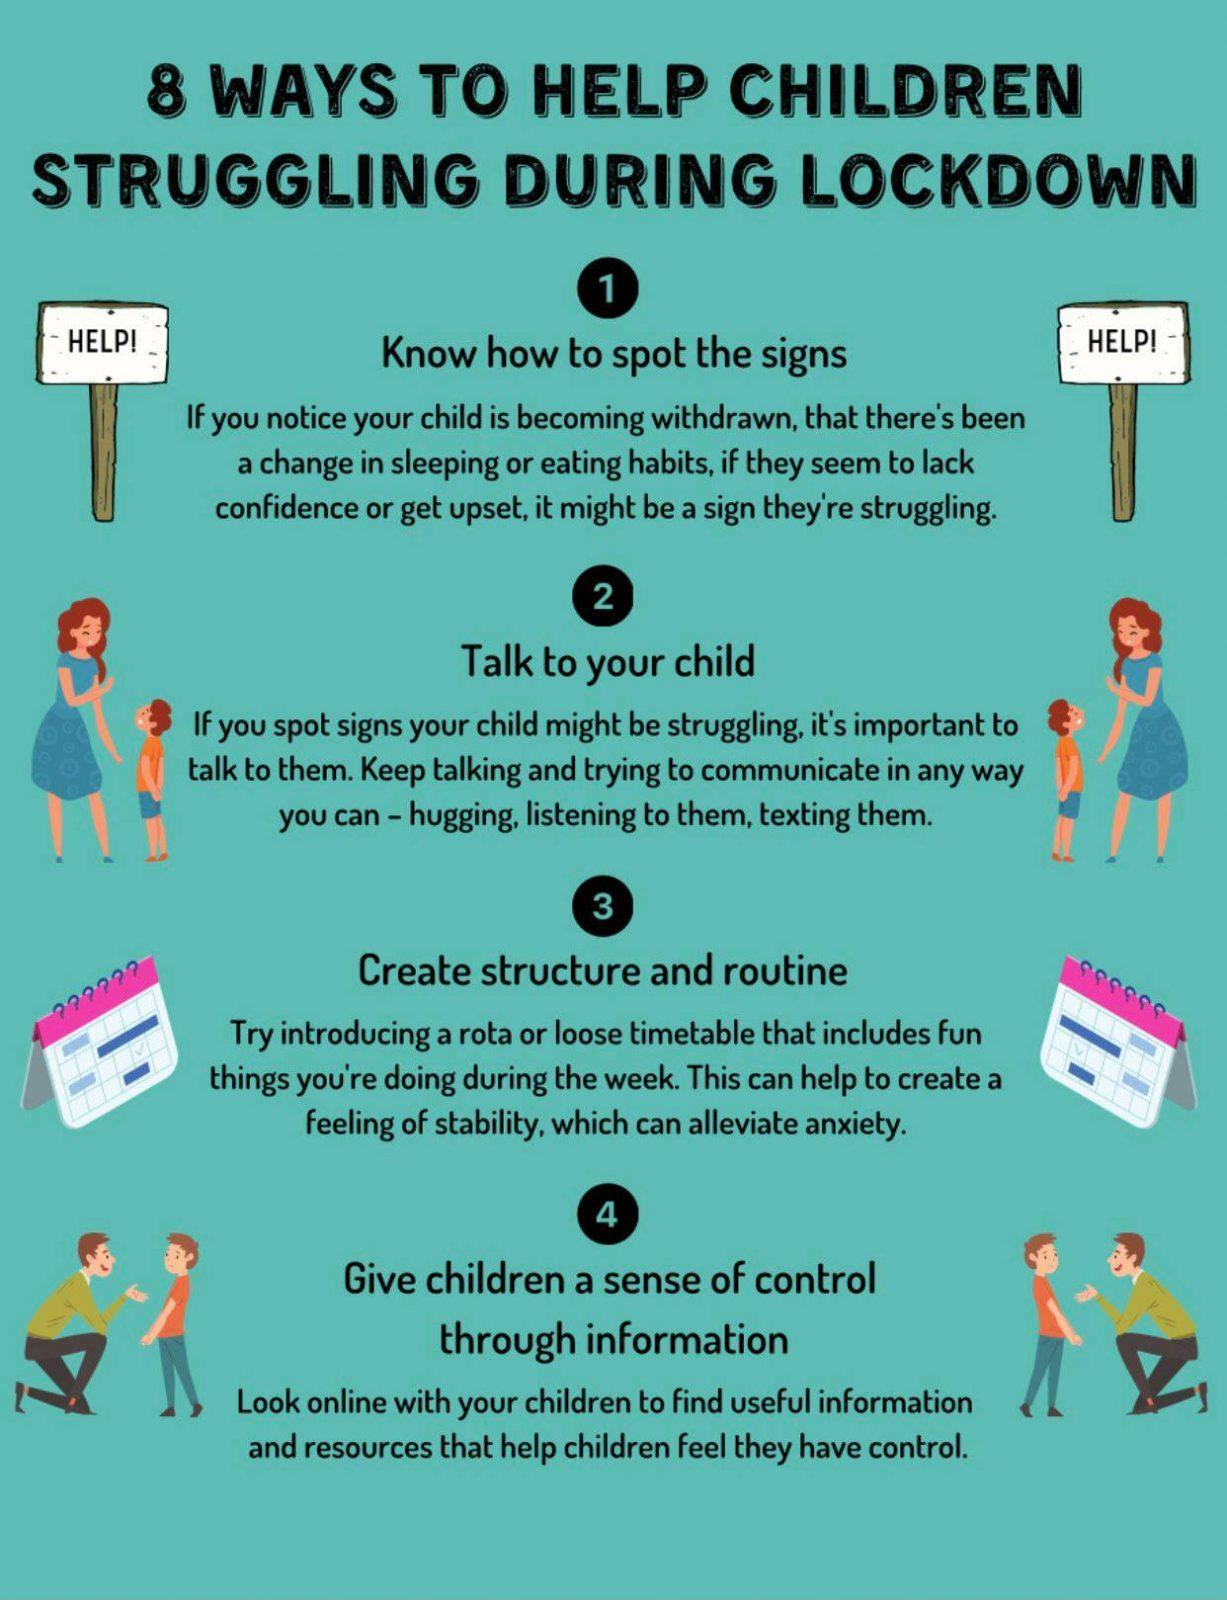 8 ways to help a child in lockdown 1